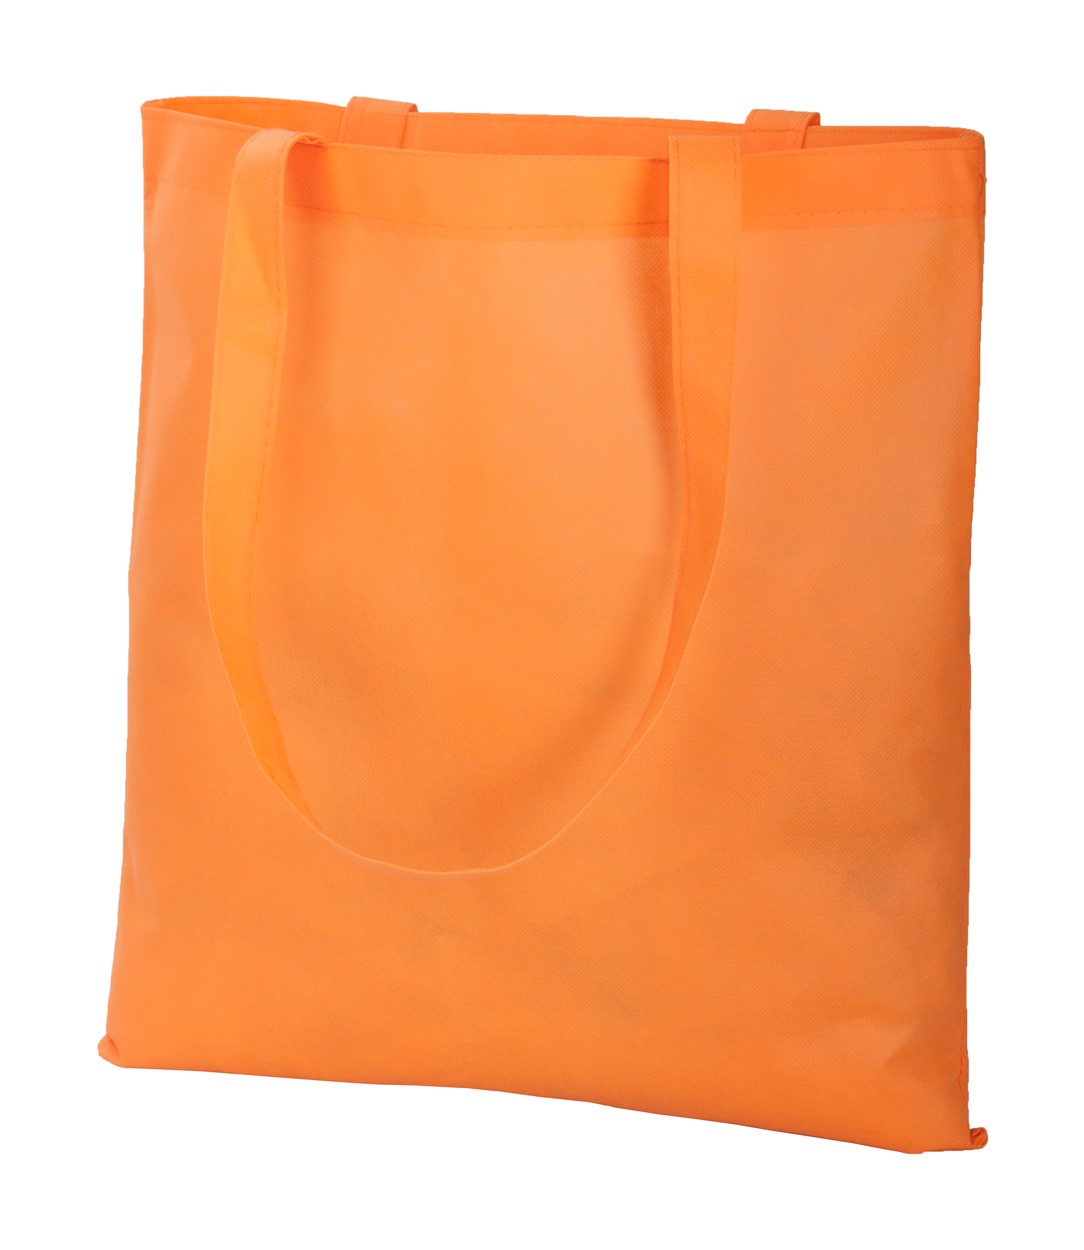 Nákupní Taška Fair - Oranžová